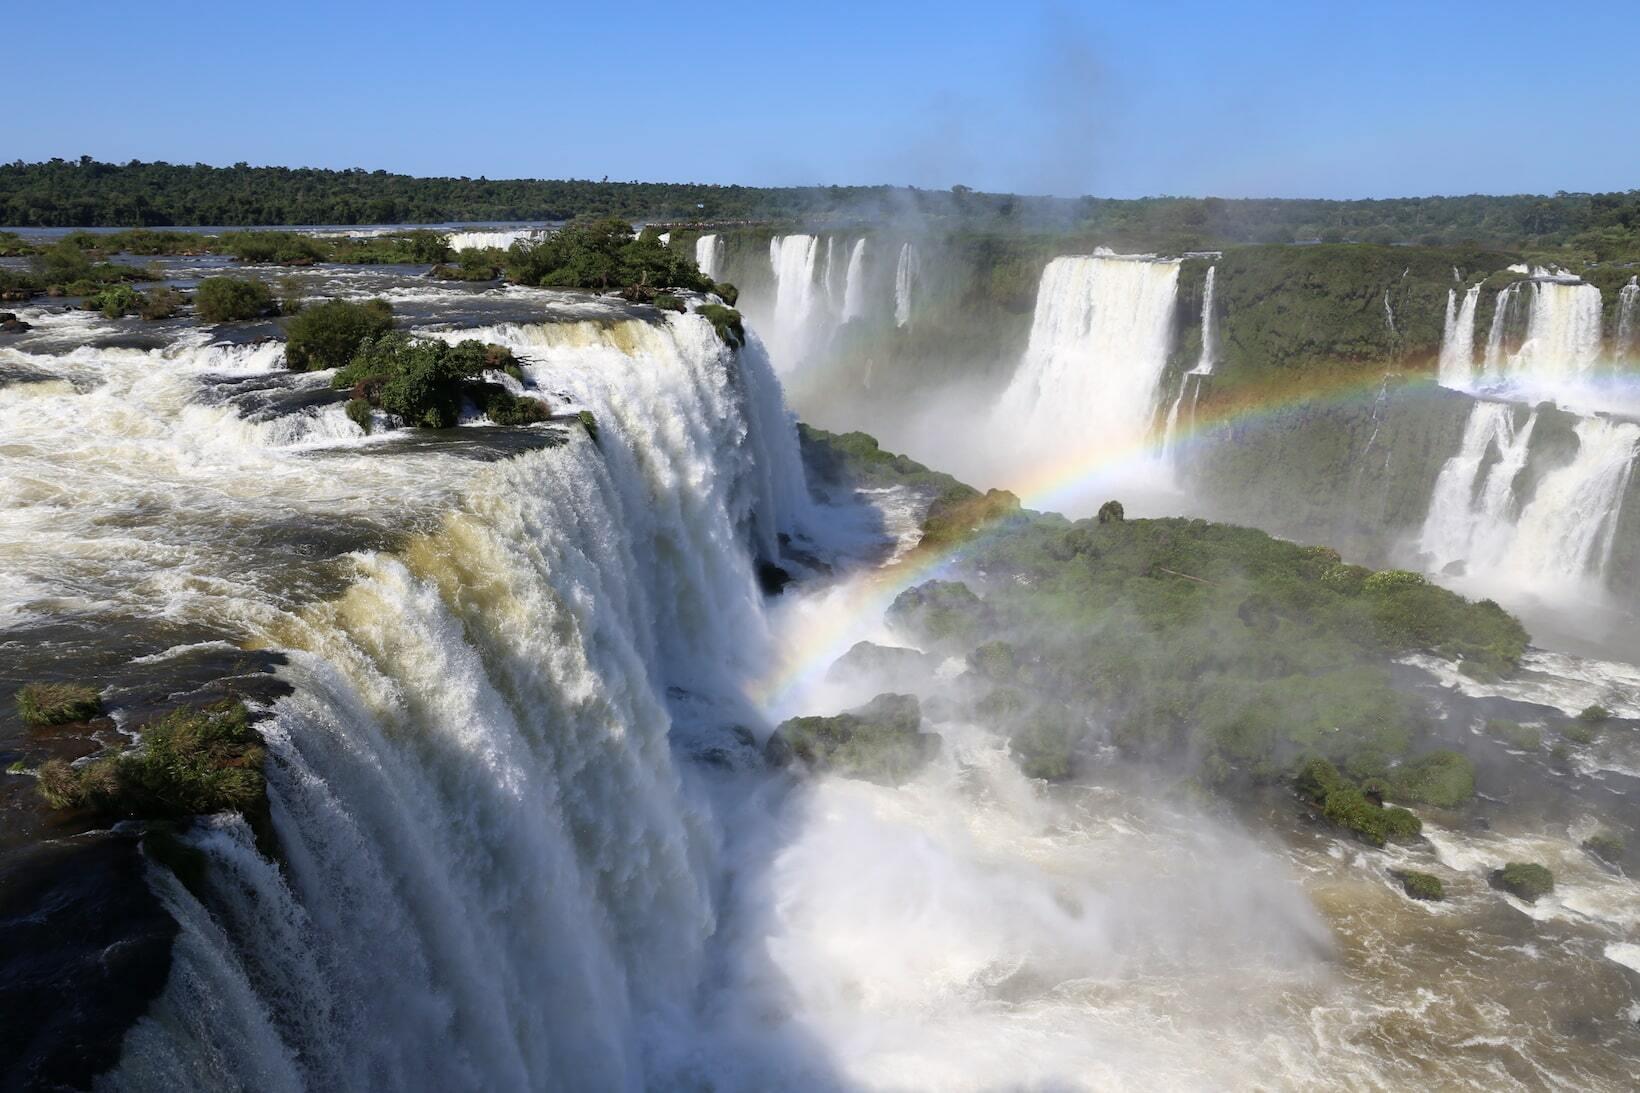 lugares viajar no brasil foz do iguacu